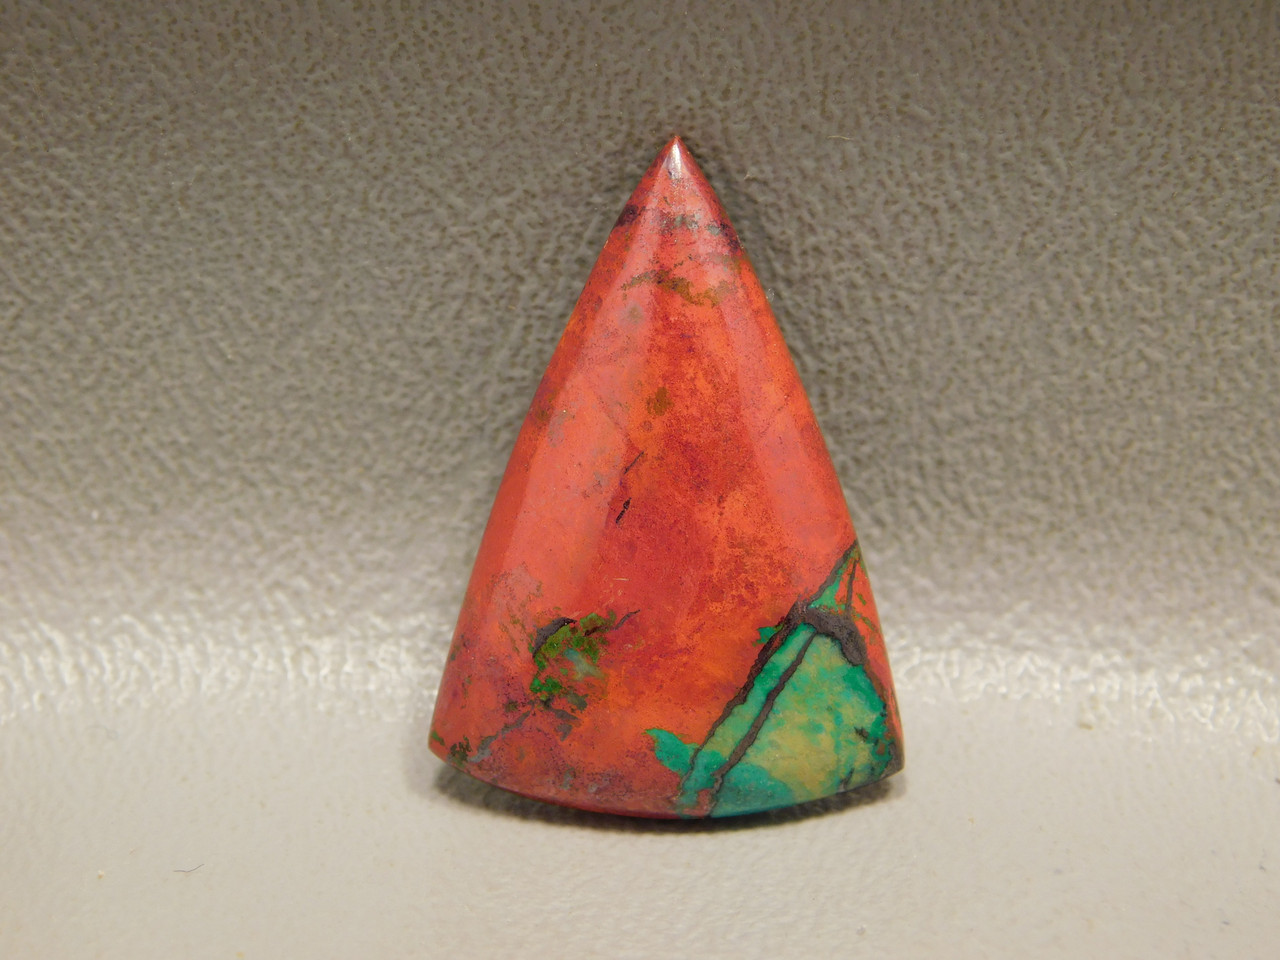 Sonora Sunset Chrysocolla Cuprite Orange Cabochon Loose Stone #3